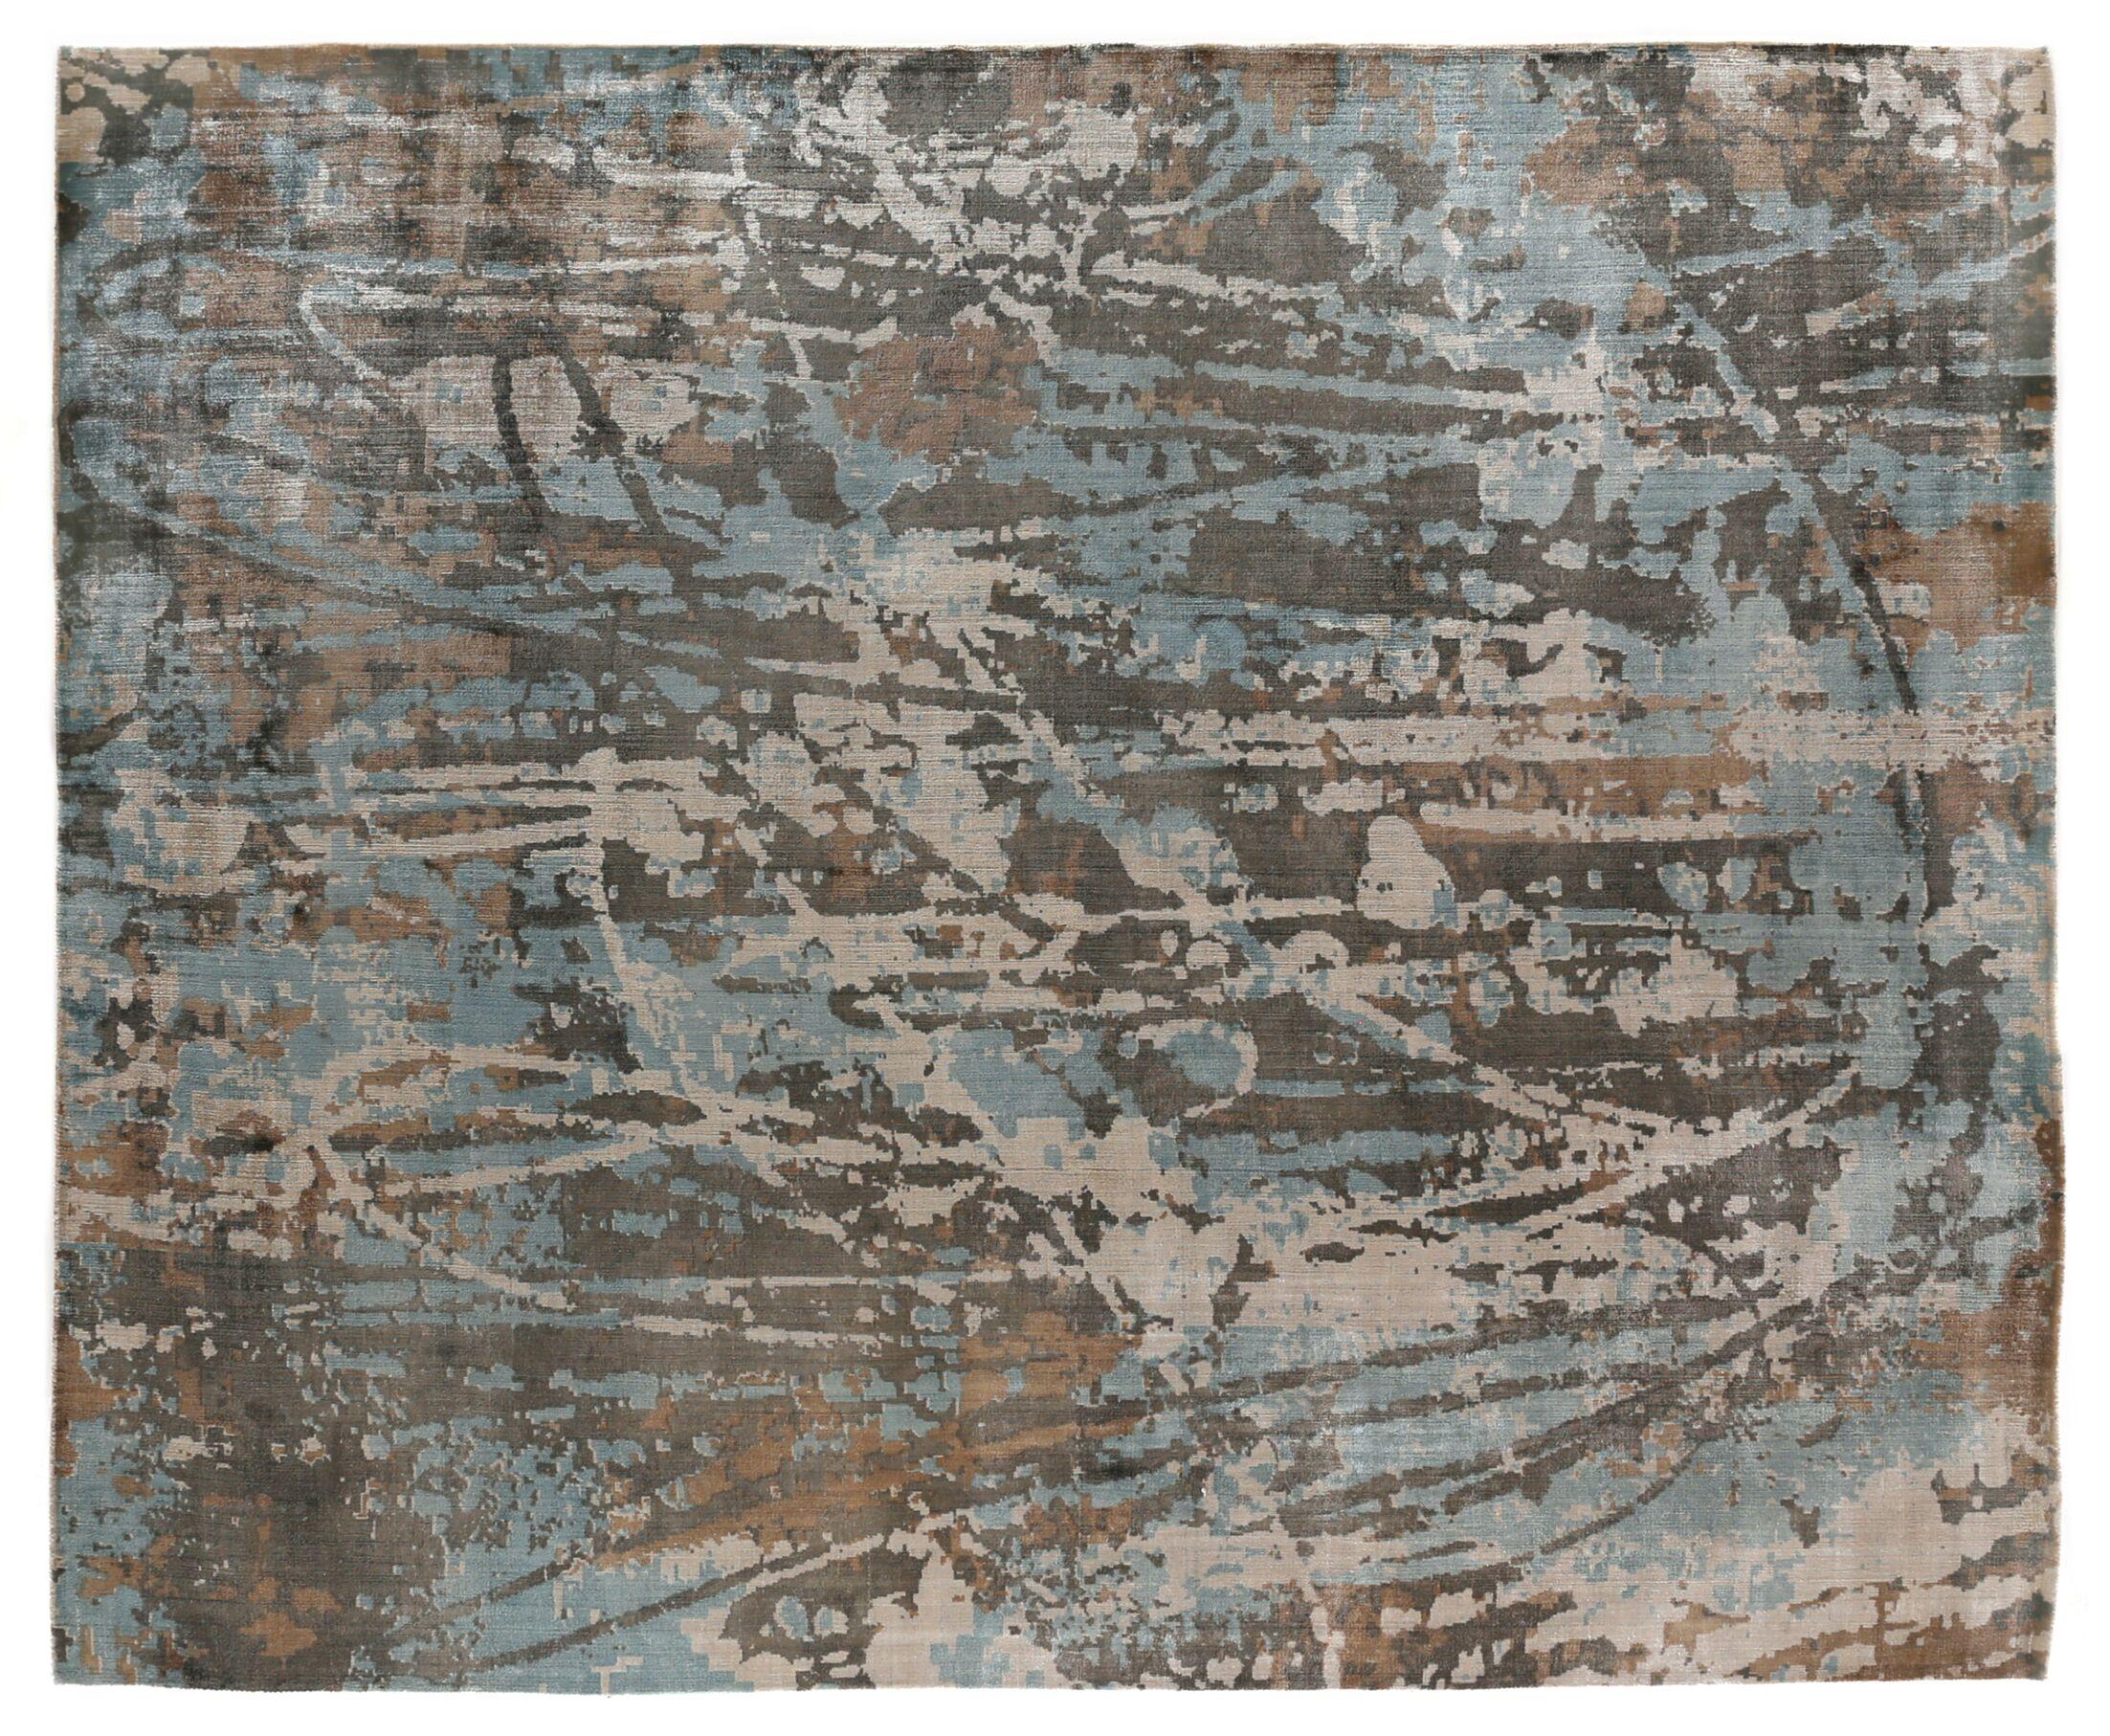 Koda Hand-Woven Blue/Brown Area Rug Rug Size: Rectangle 8' x 10'